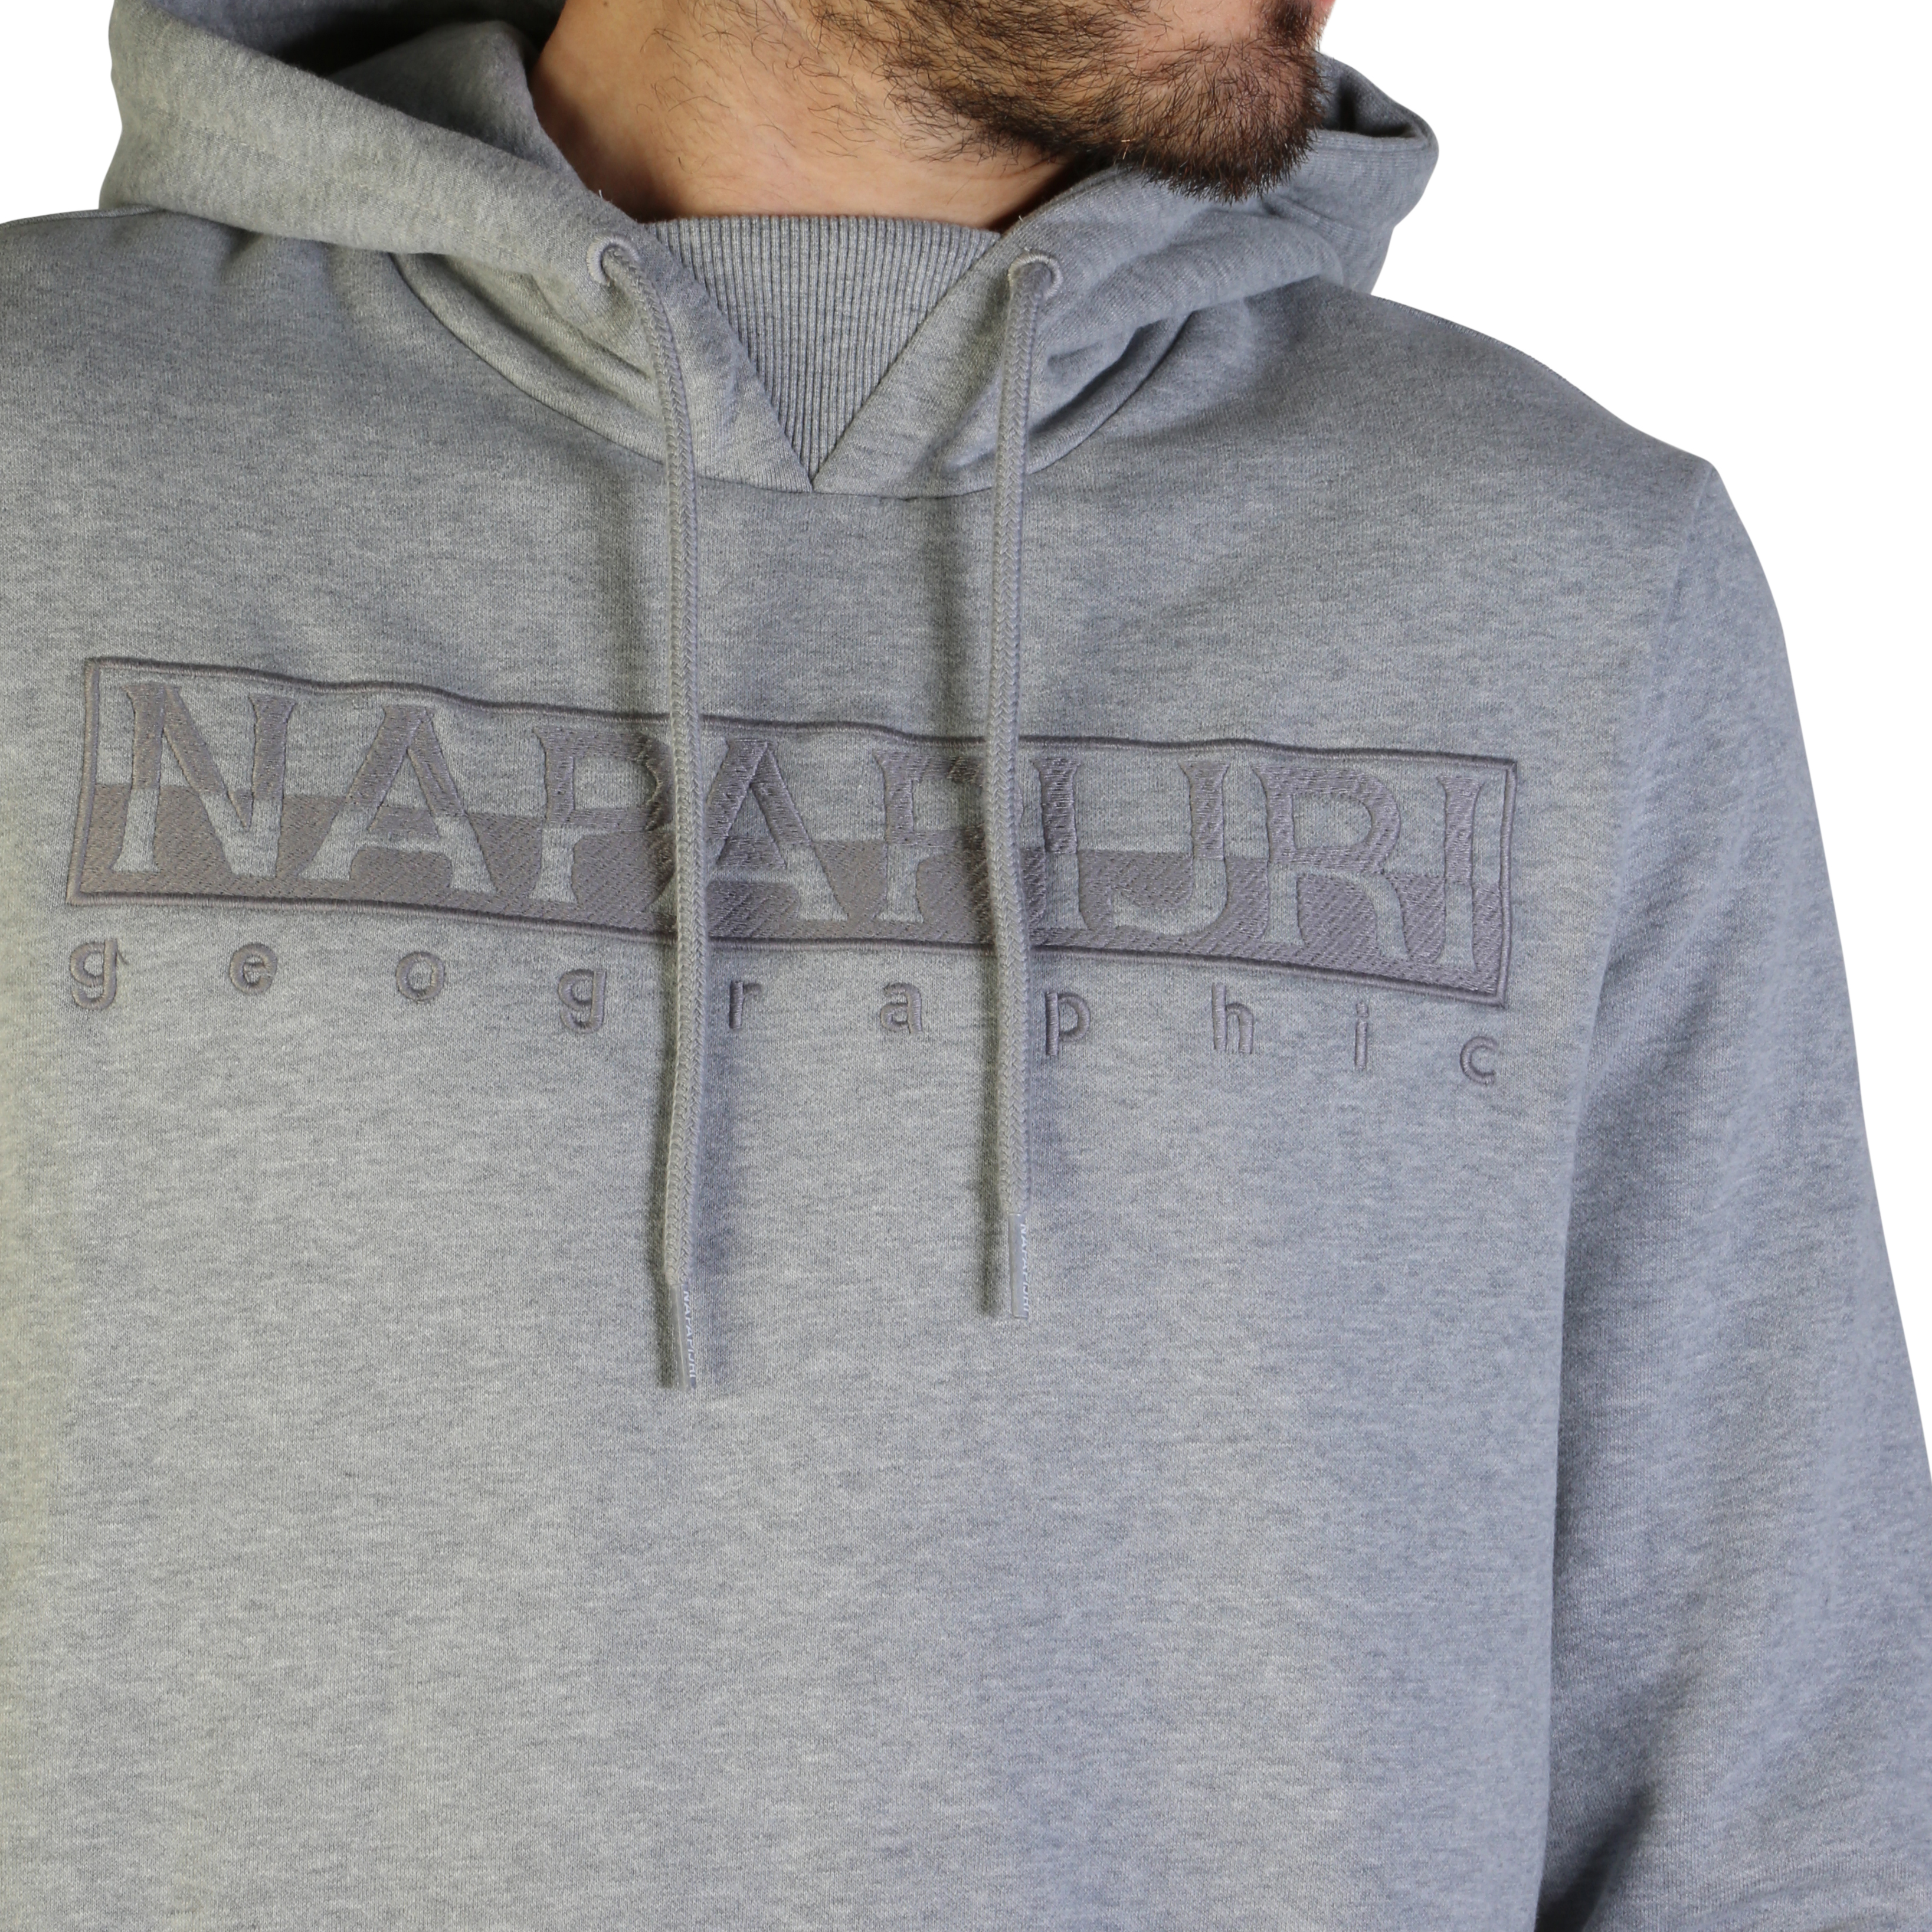 Sweatshirts  Napapijri BERBER H_N0YIWP grey